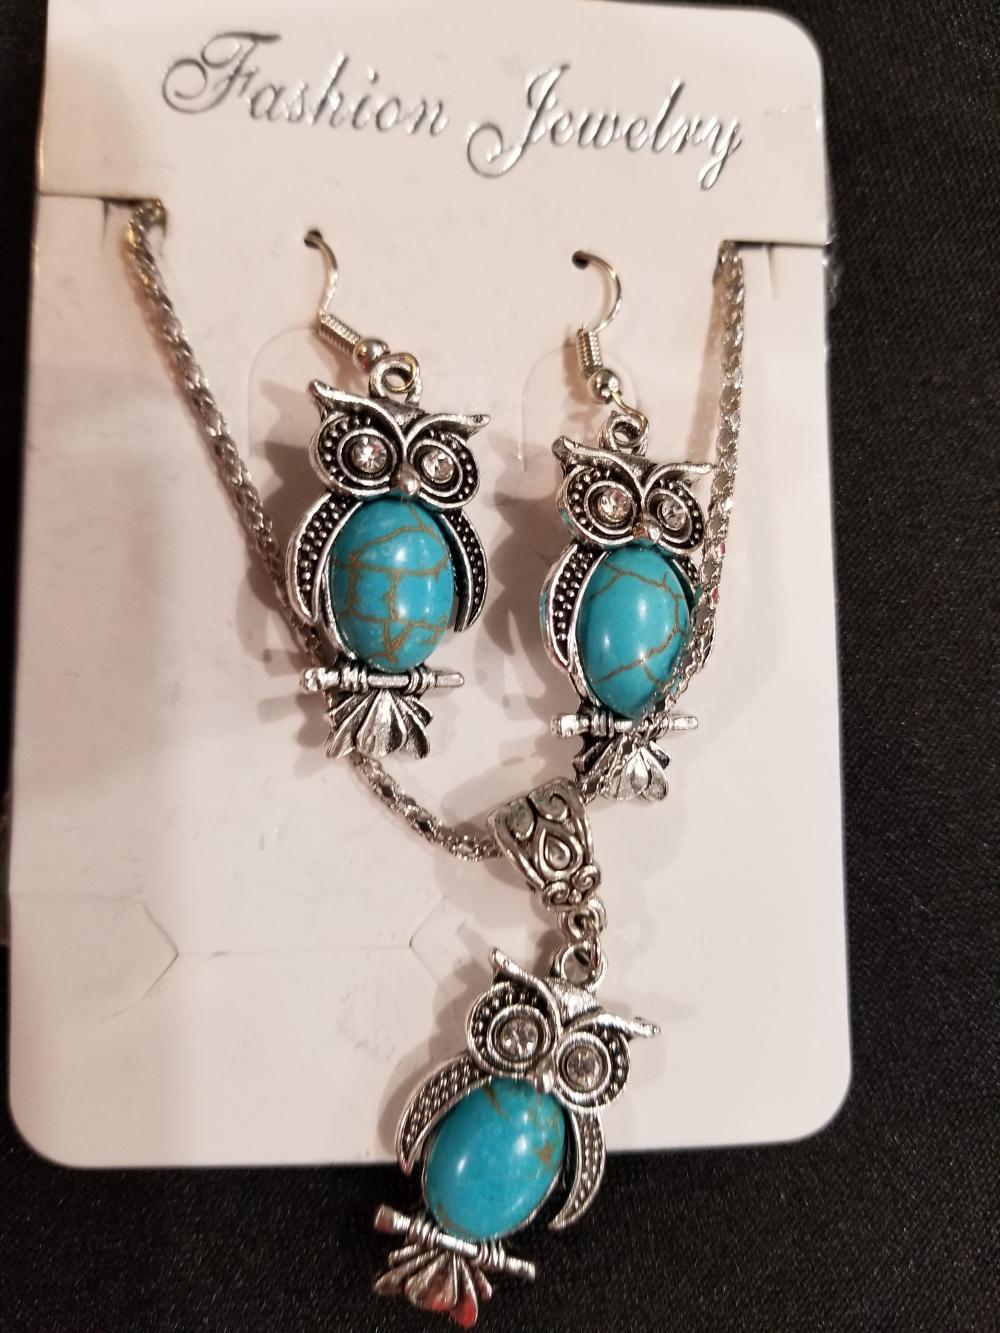 Lot 20: Jewelry